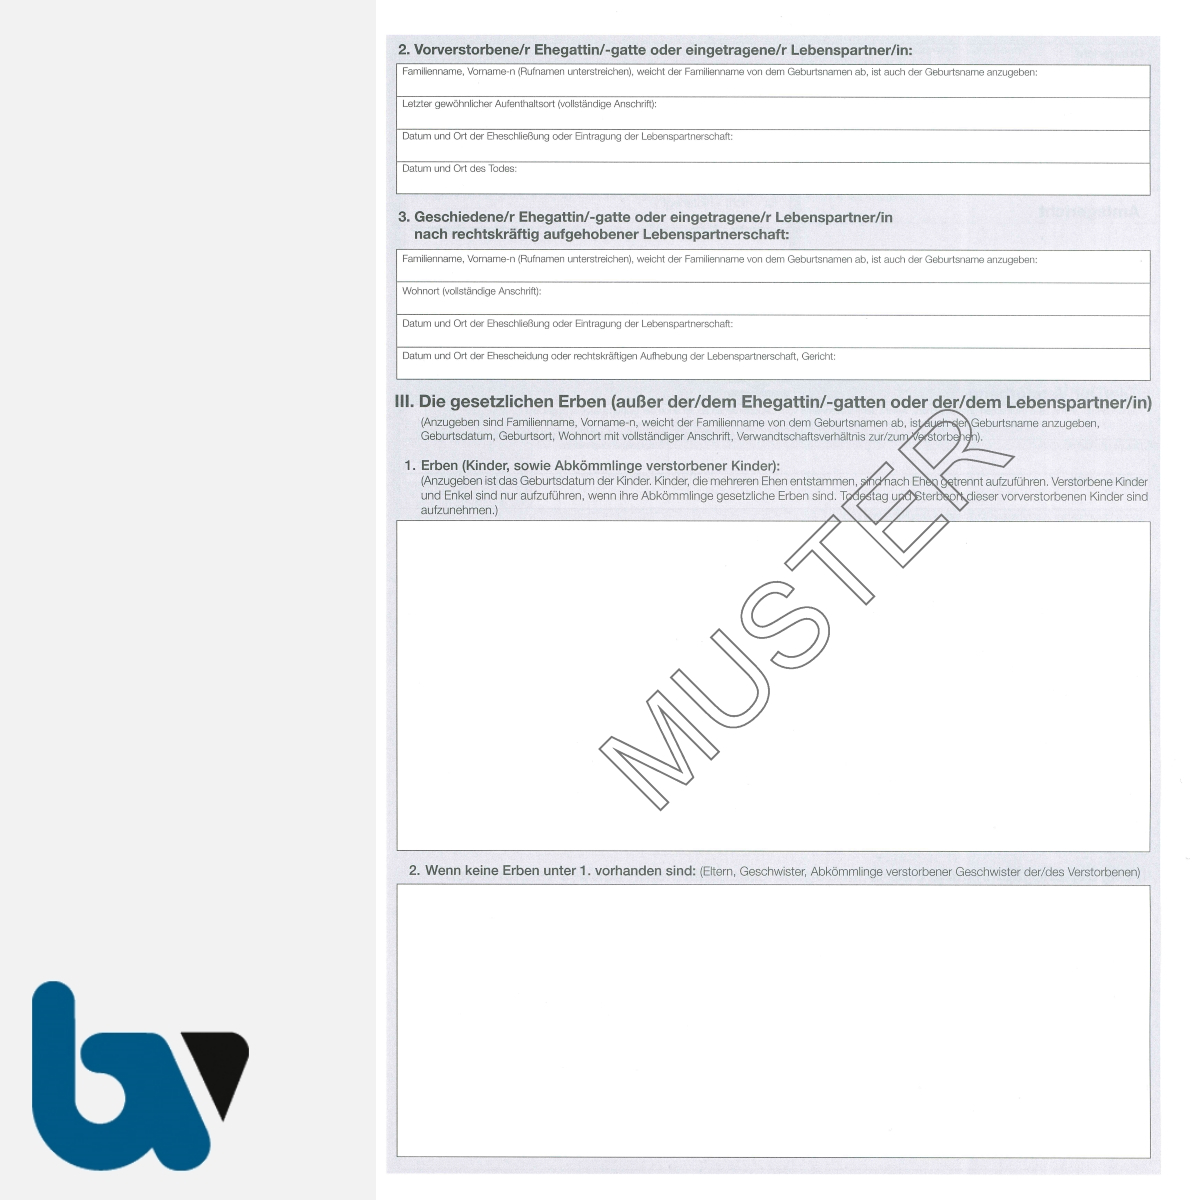 3/185-8a Sterbefallsanzeige Sterbefallanzeige Ortsgericht Hessen Muster amtlich Solo DIN A4 Seite 2 | Borgard Verlag GmbH